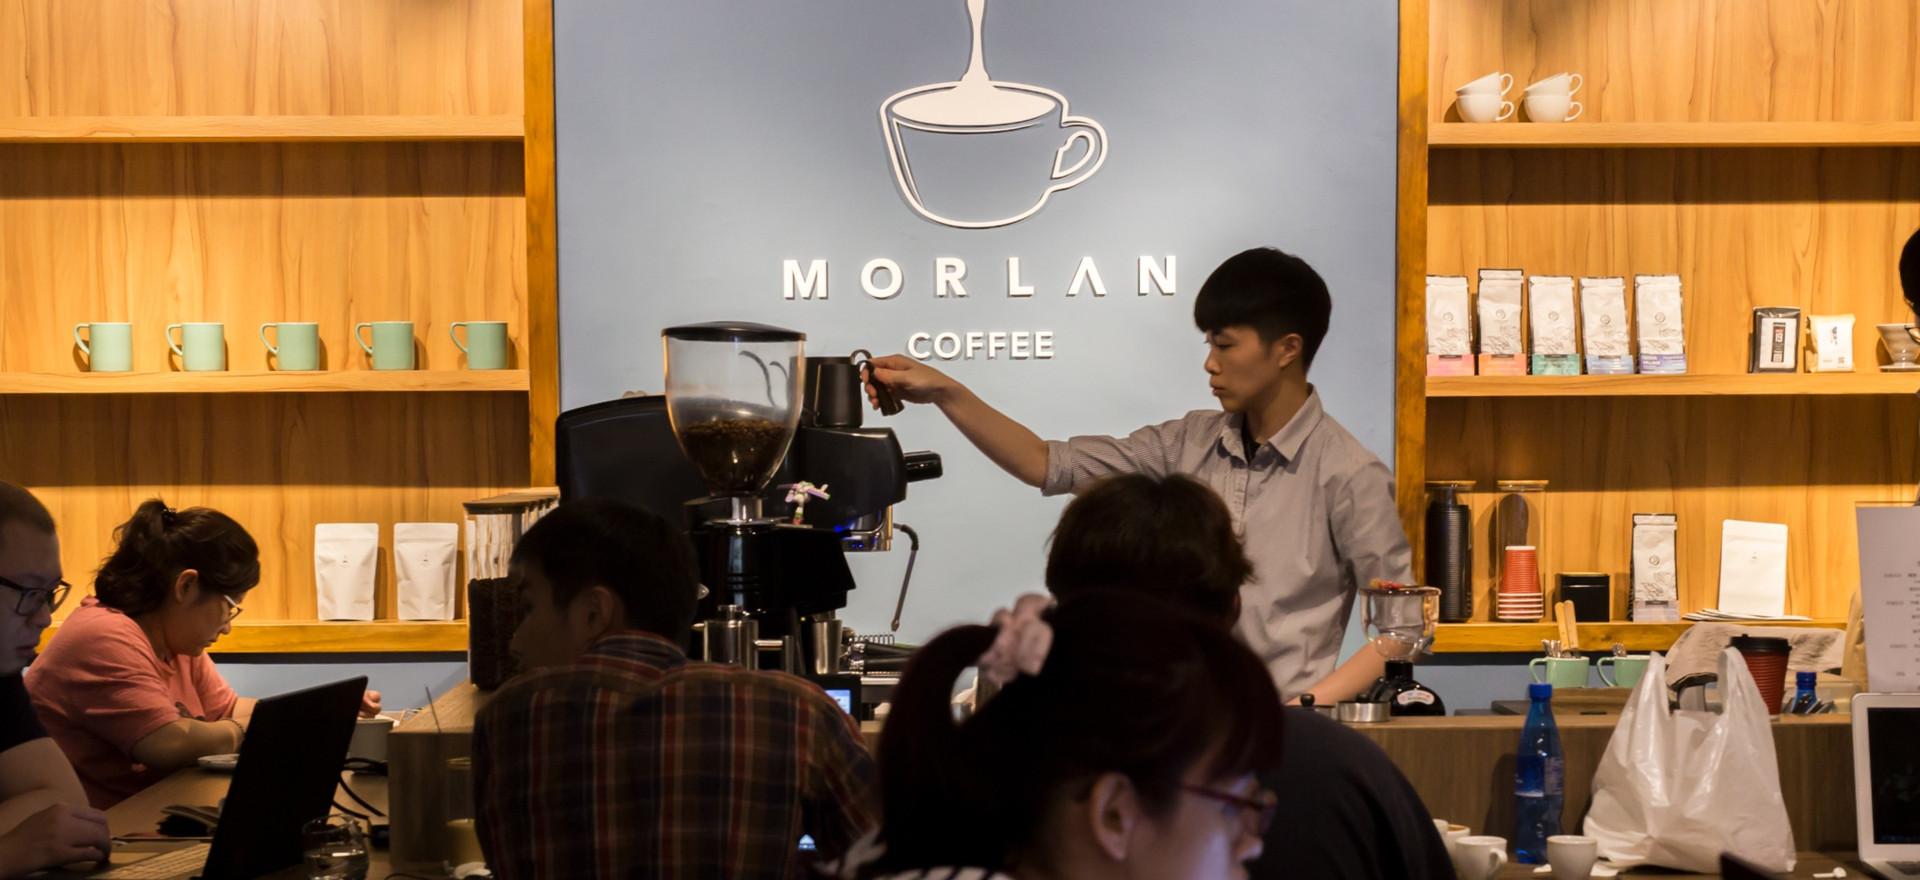 MORLAN COFFEE